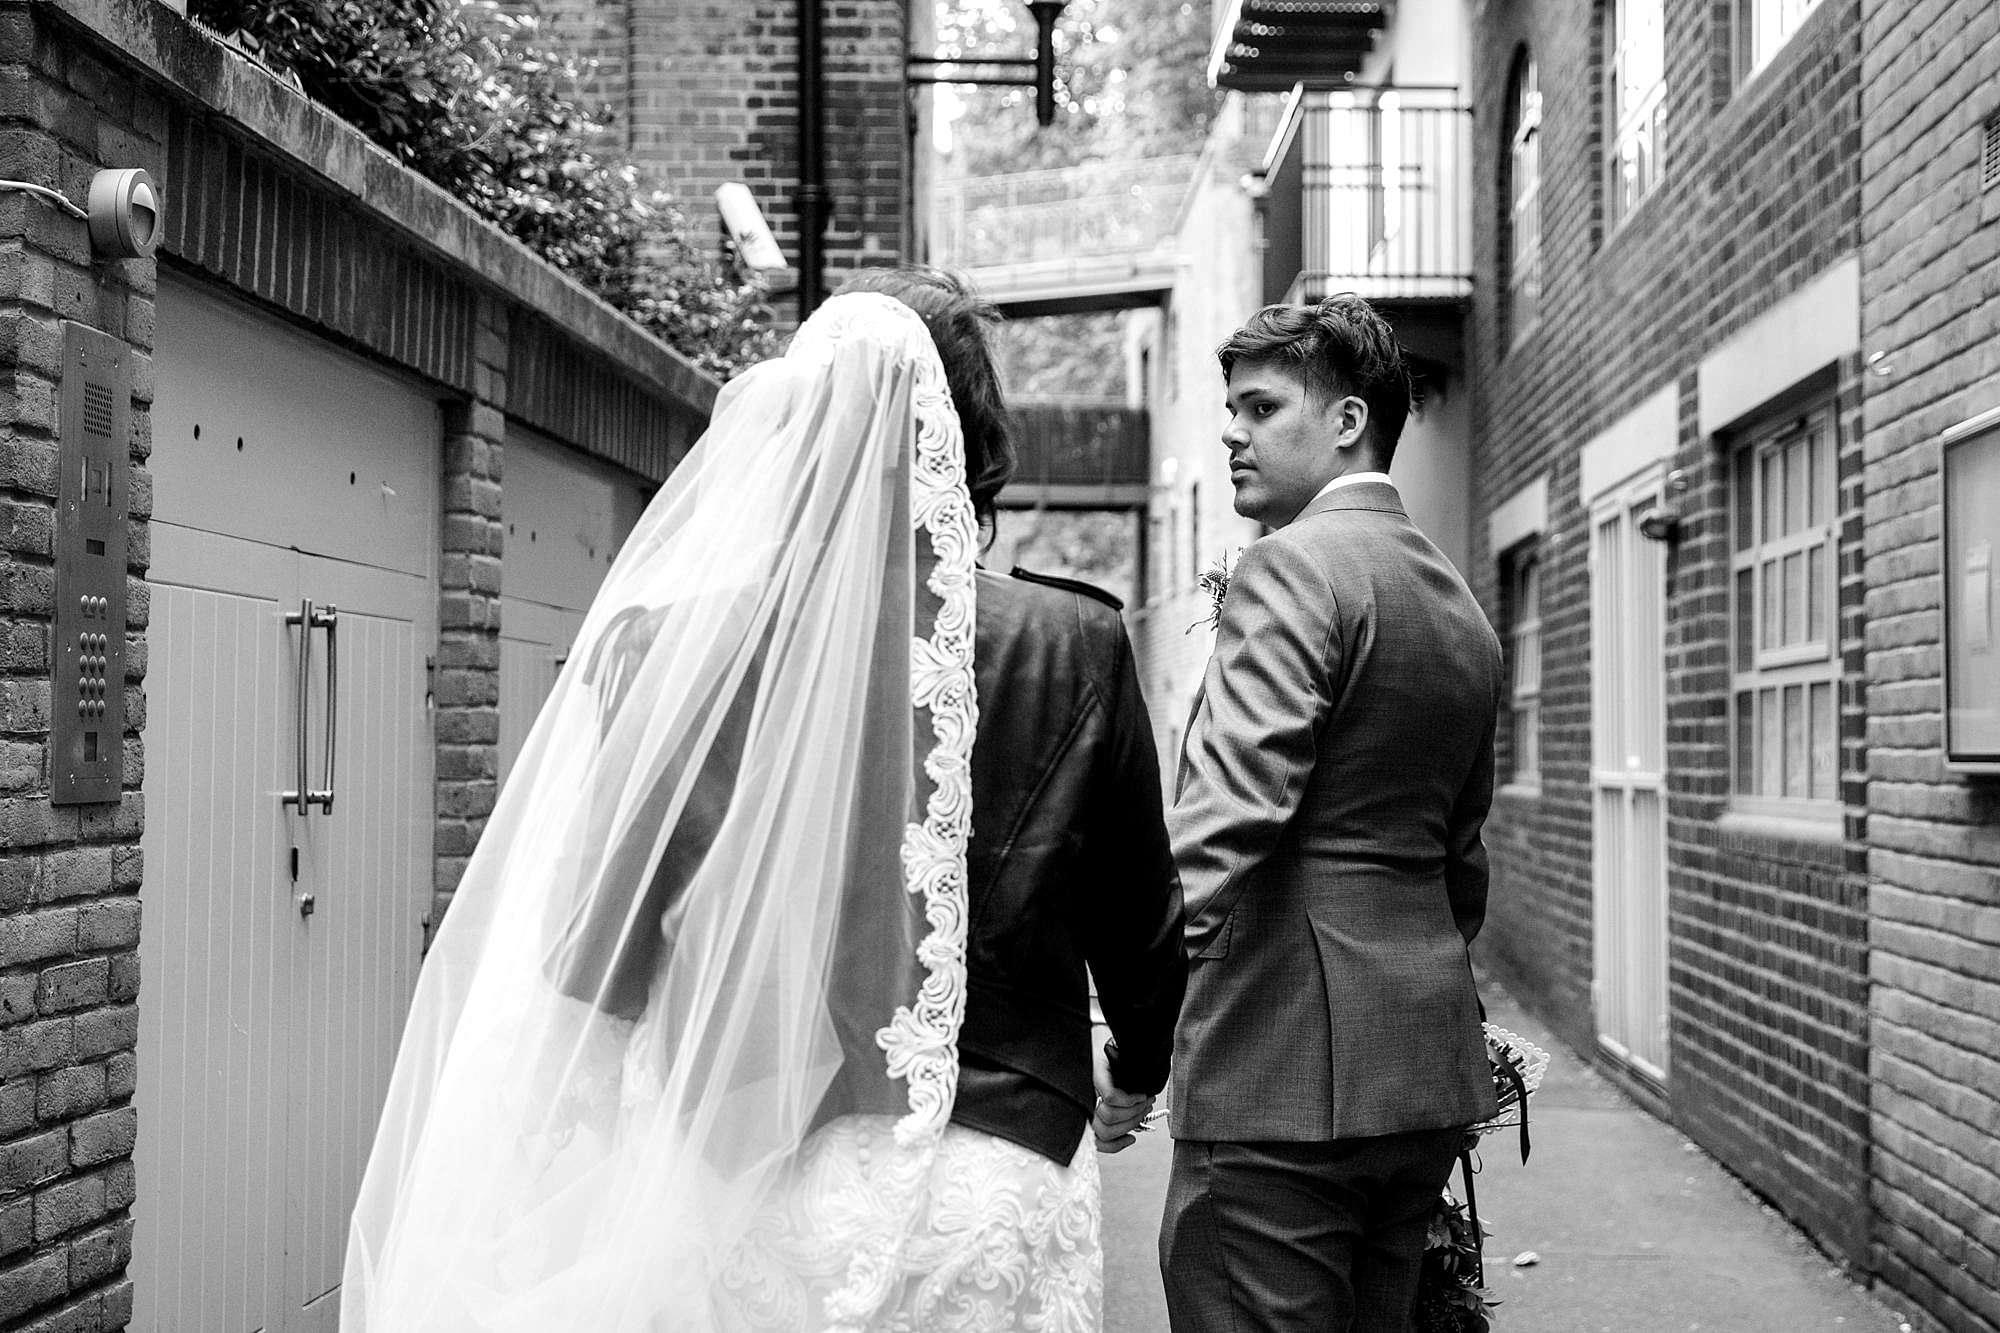 Brunel museum wedding bride and groom walking through alleyway